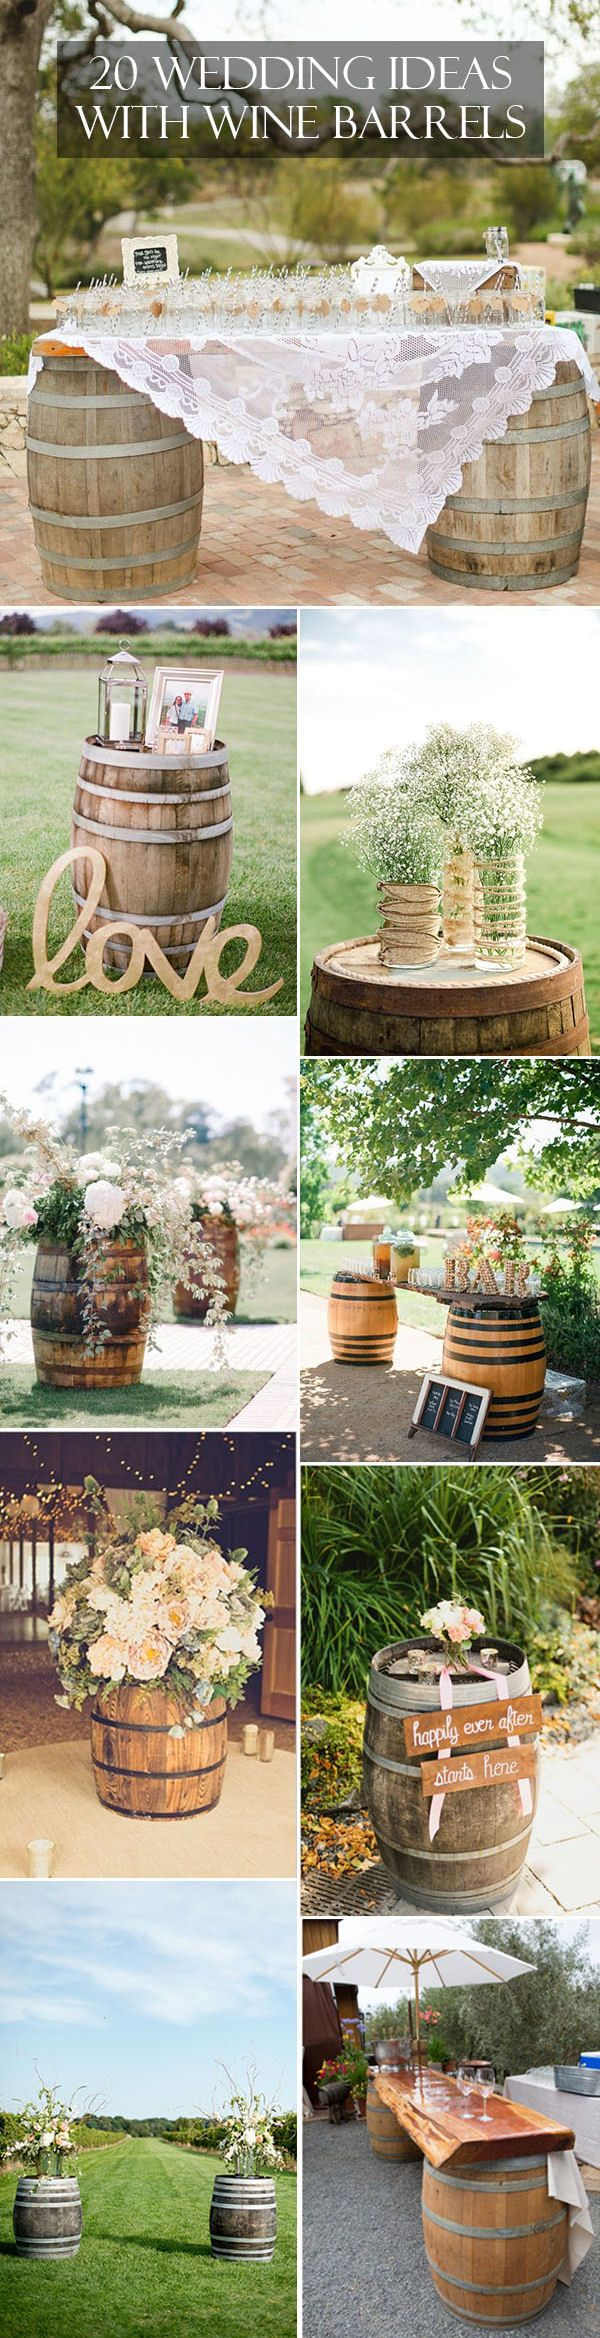 Emerald wedding decor ideas  Country Wedding Ideas  Ways to Use Wine Barrels  My future